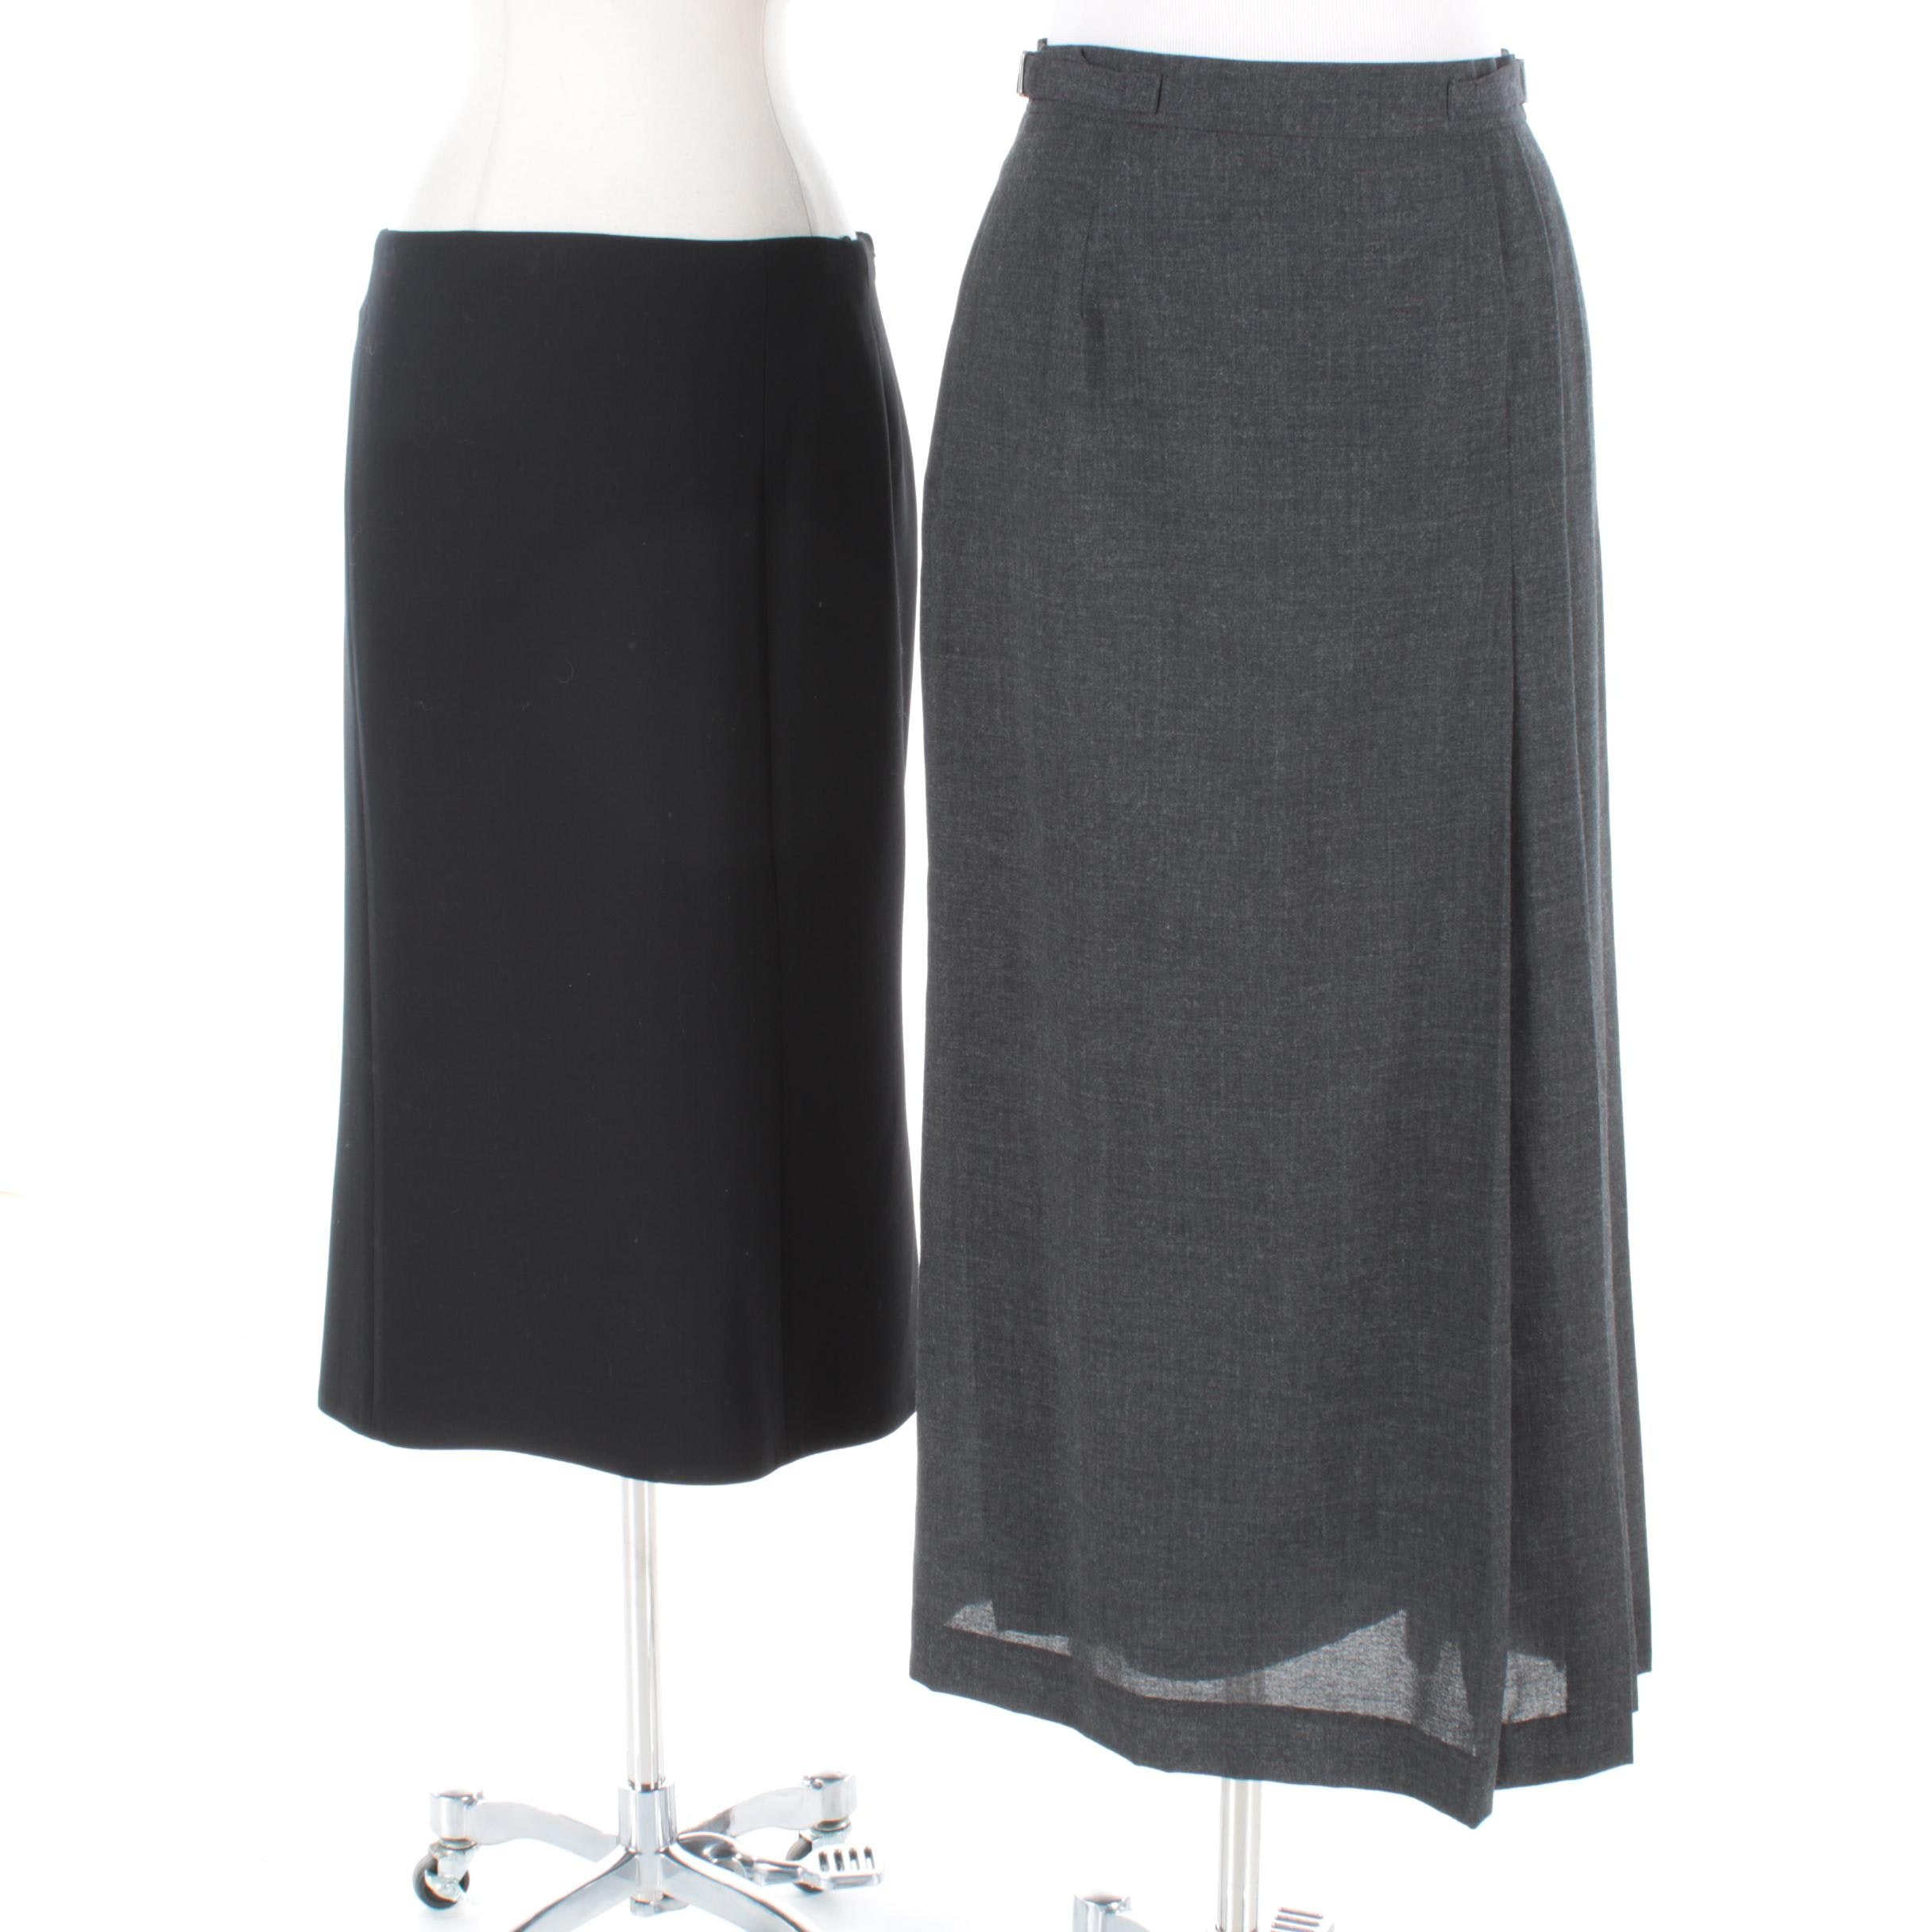 Ralph Lauren Black Label and Louis Féraud Wool Skirts